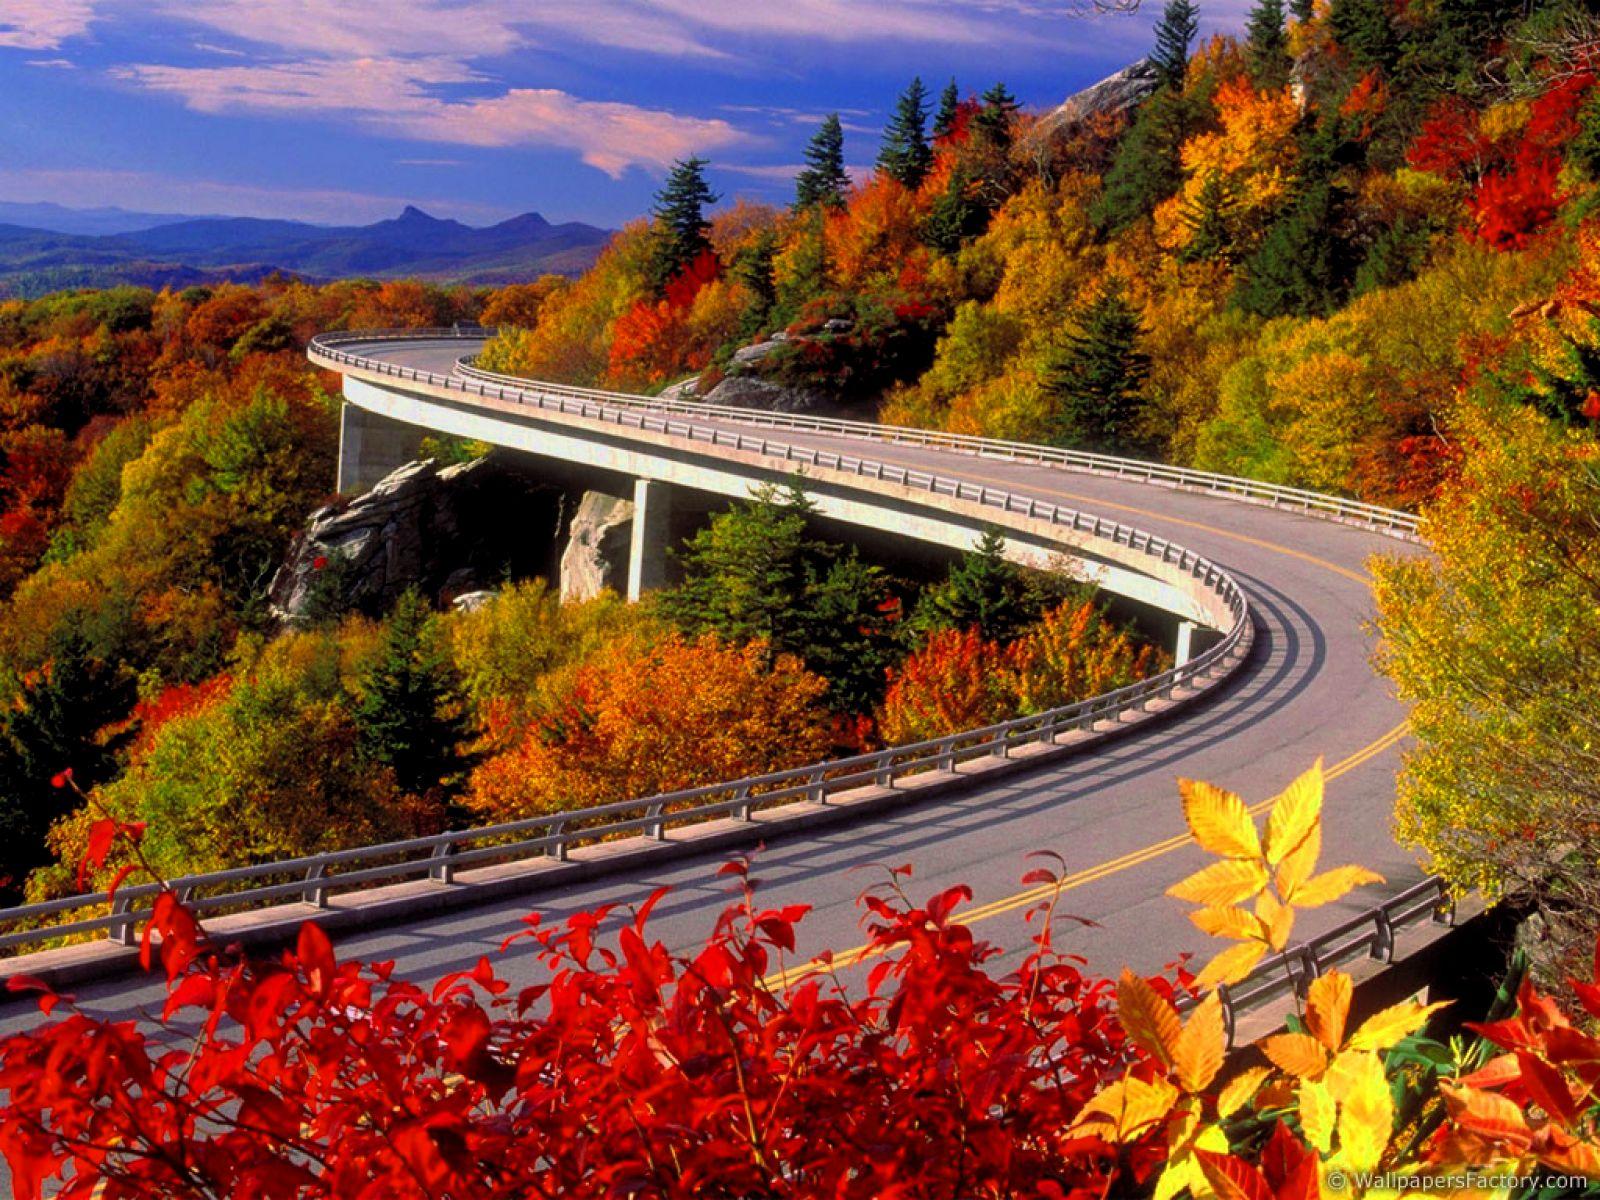 Fall Mountains Wallpaper   tianyihengfeng Free Download High